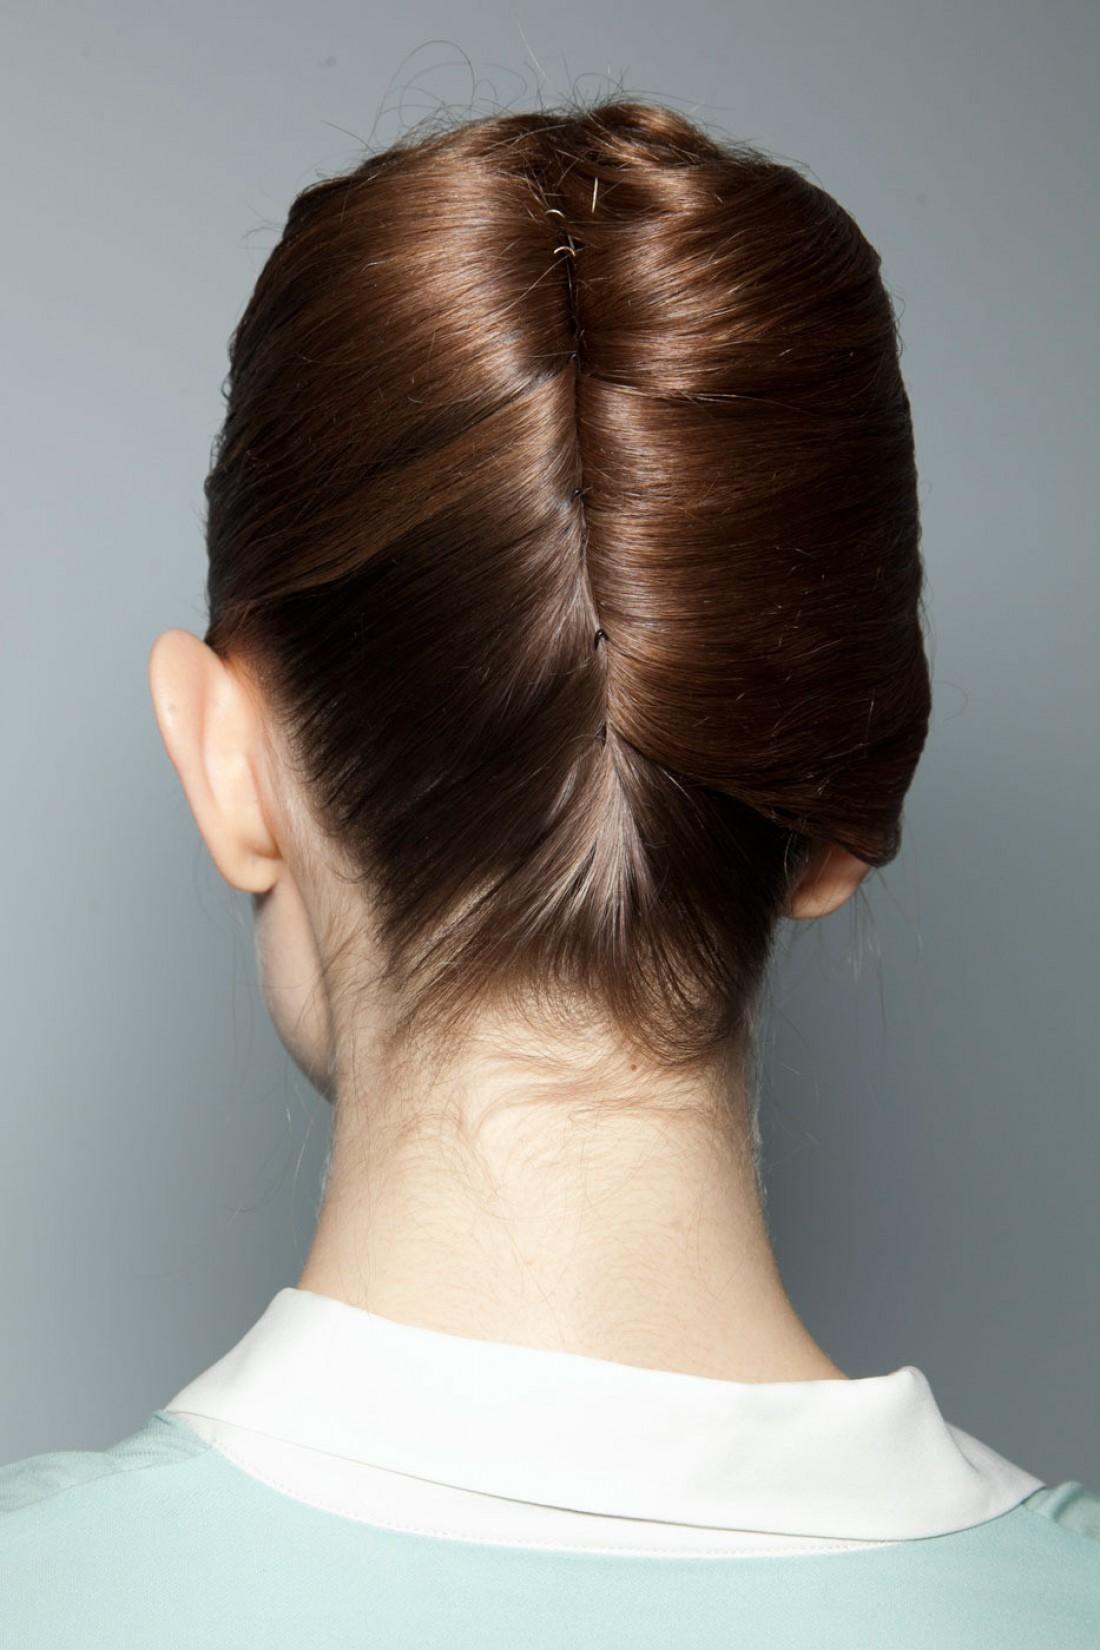 Главные hair-ошибки, которые старят: ракушка